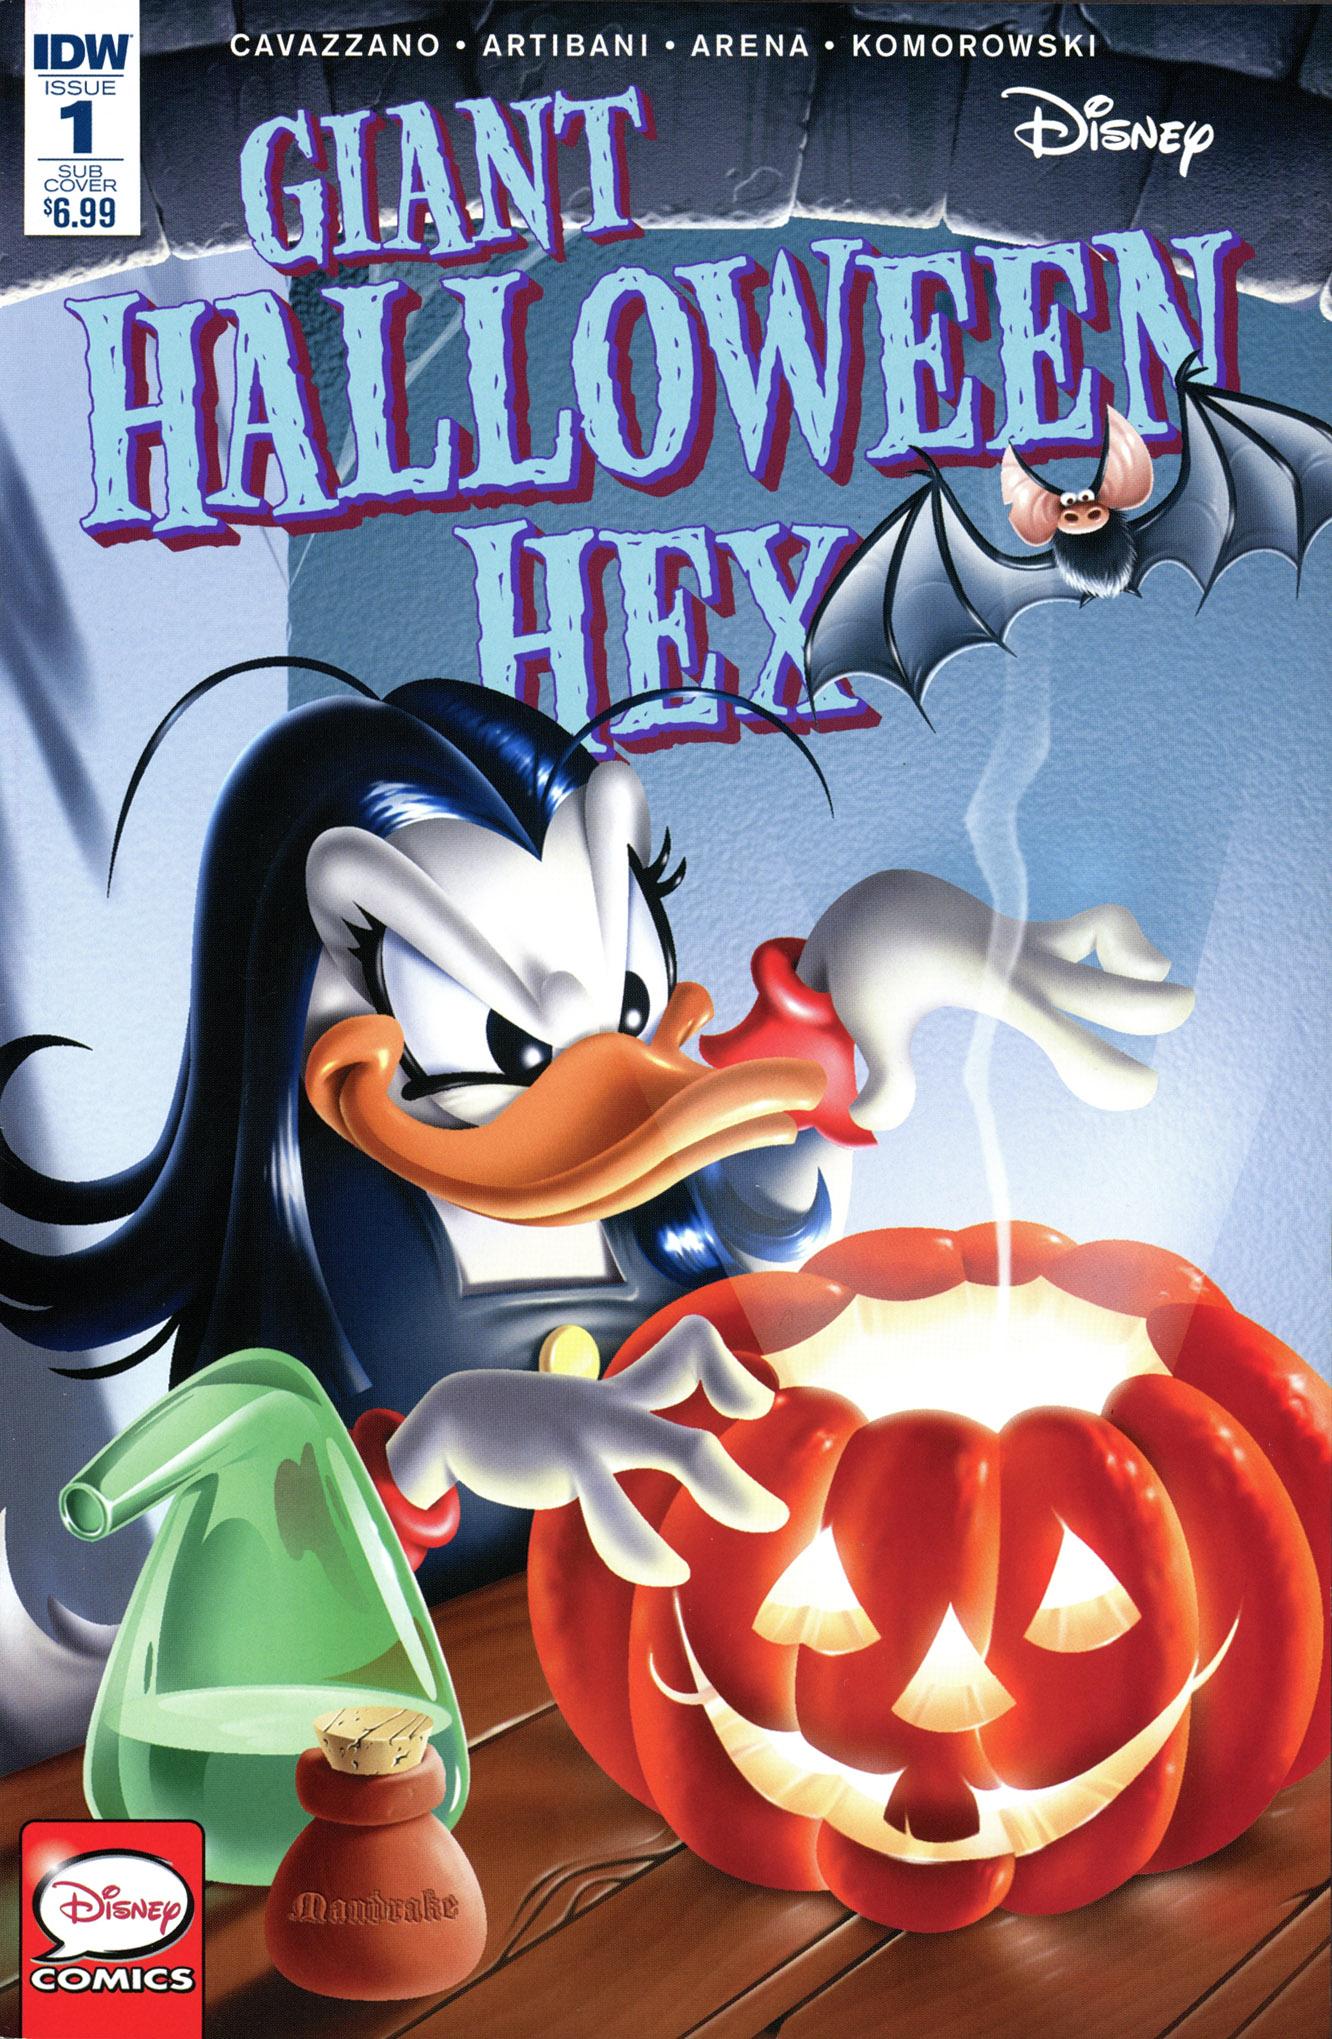 Disney Giant Halloween Hex Full Page 1